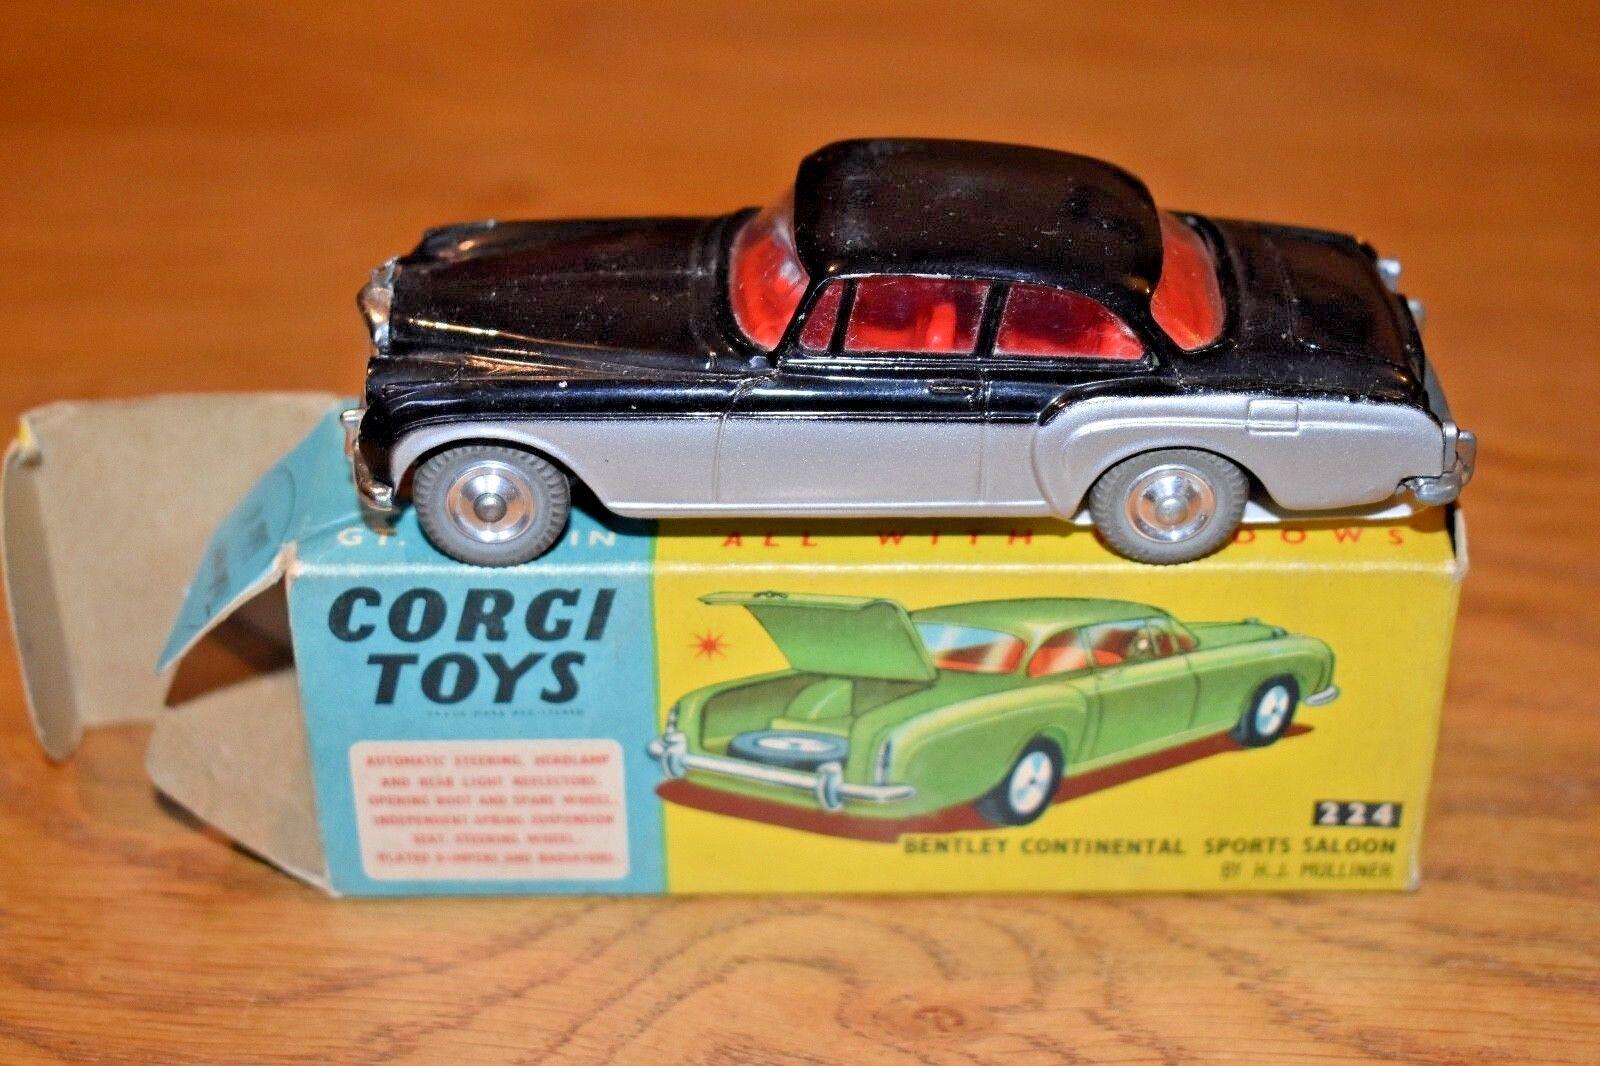 Corgi Toys 224 Bentley continental sports saloon; Original Box